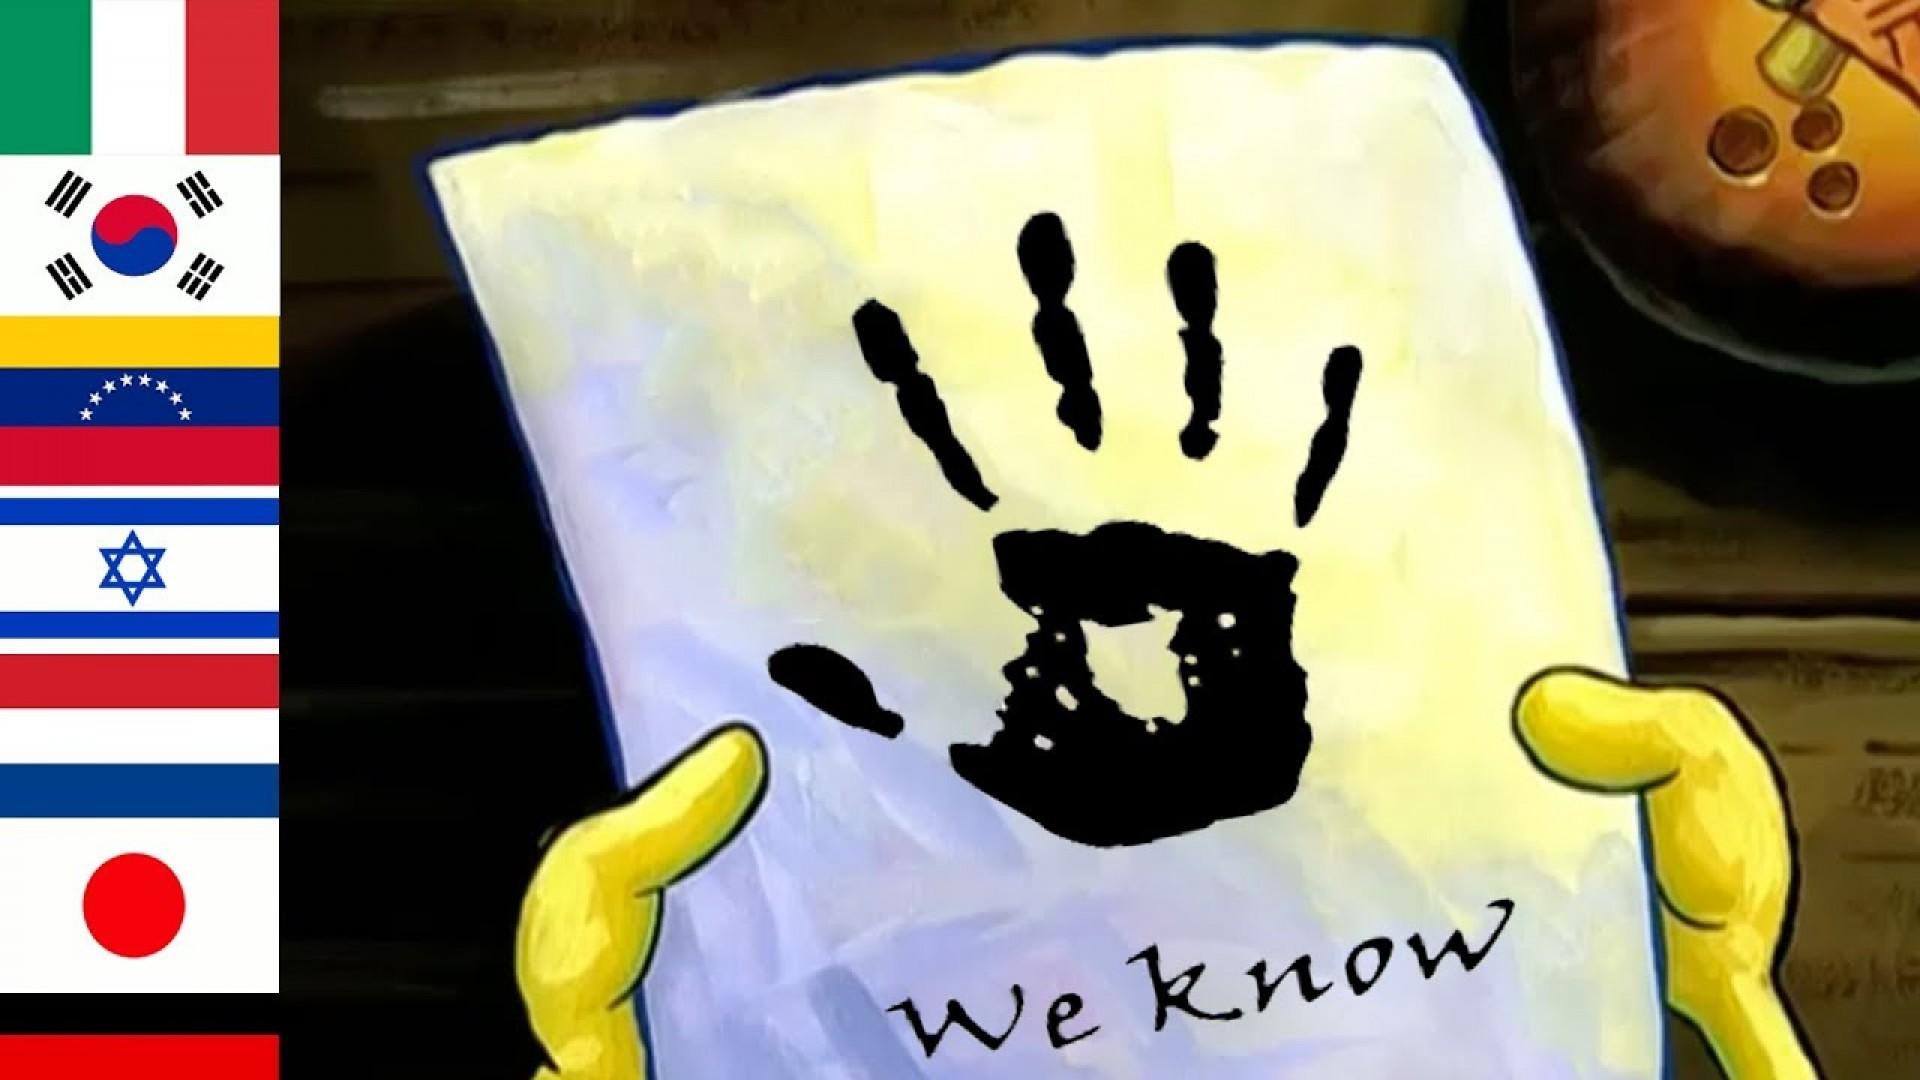 006 Spongebob Essay Meme Maxresdefault Stirring Font Generator 1920